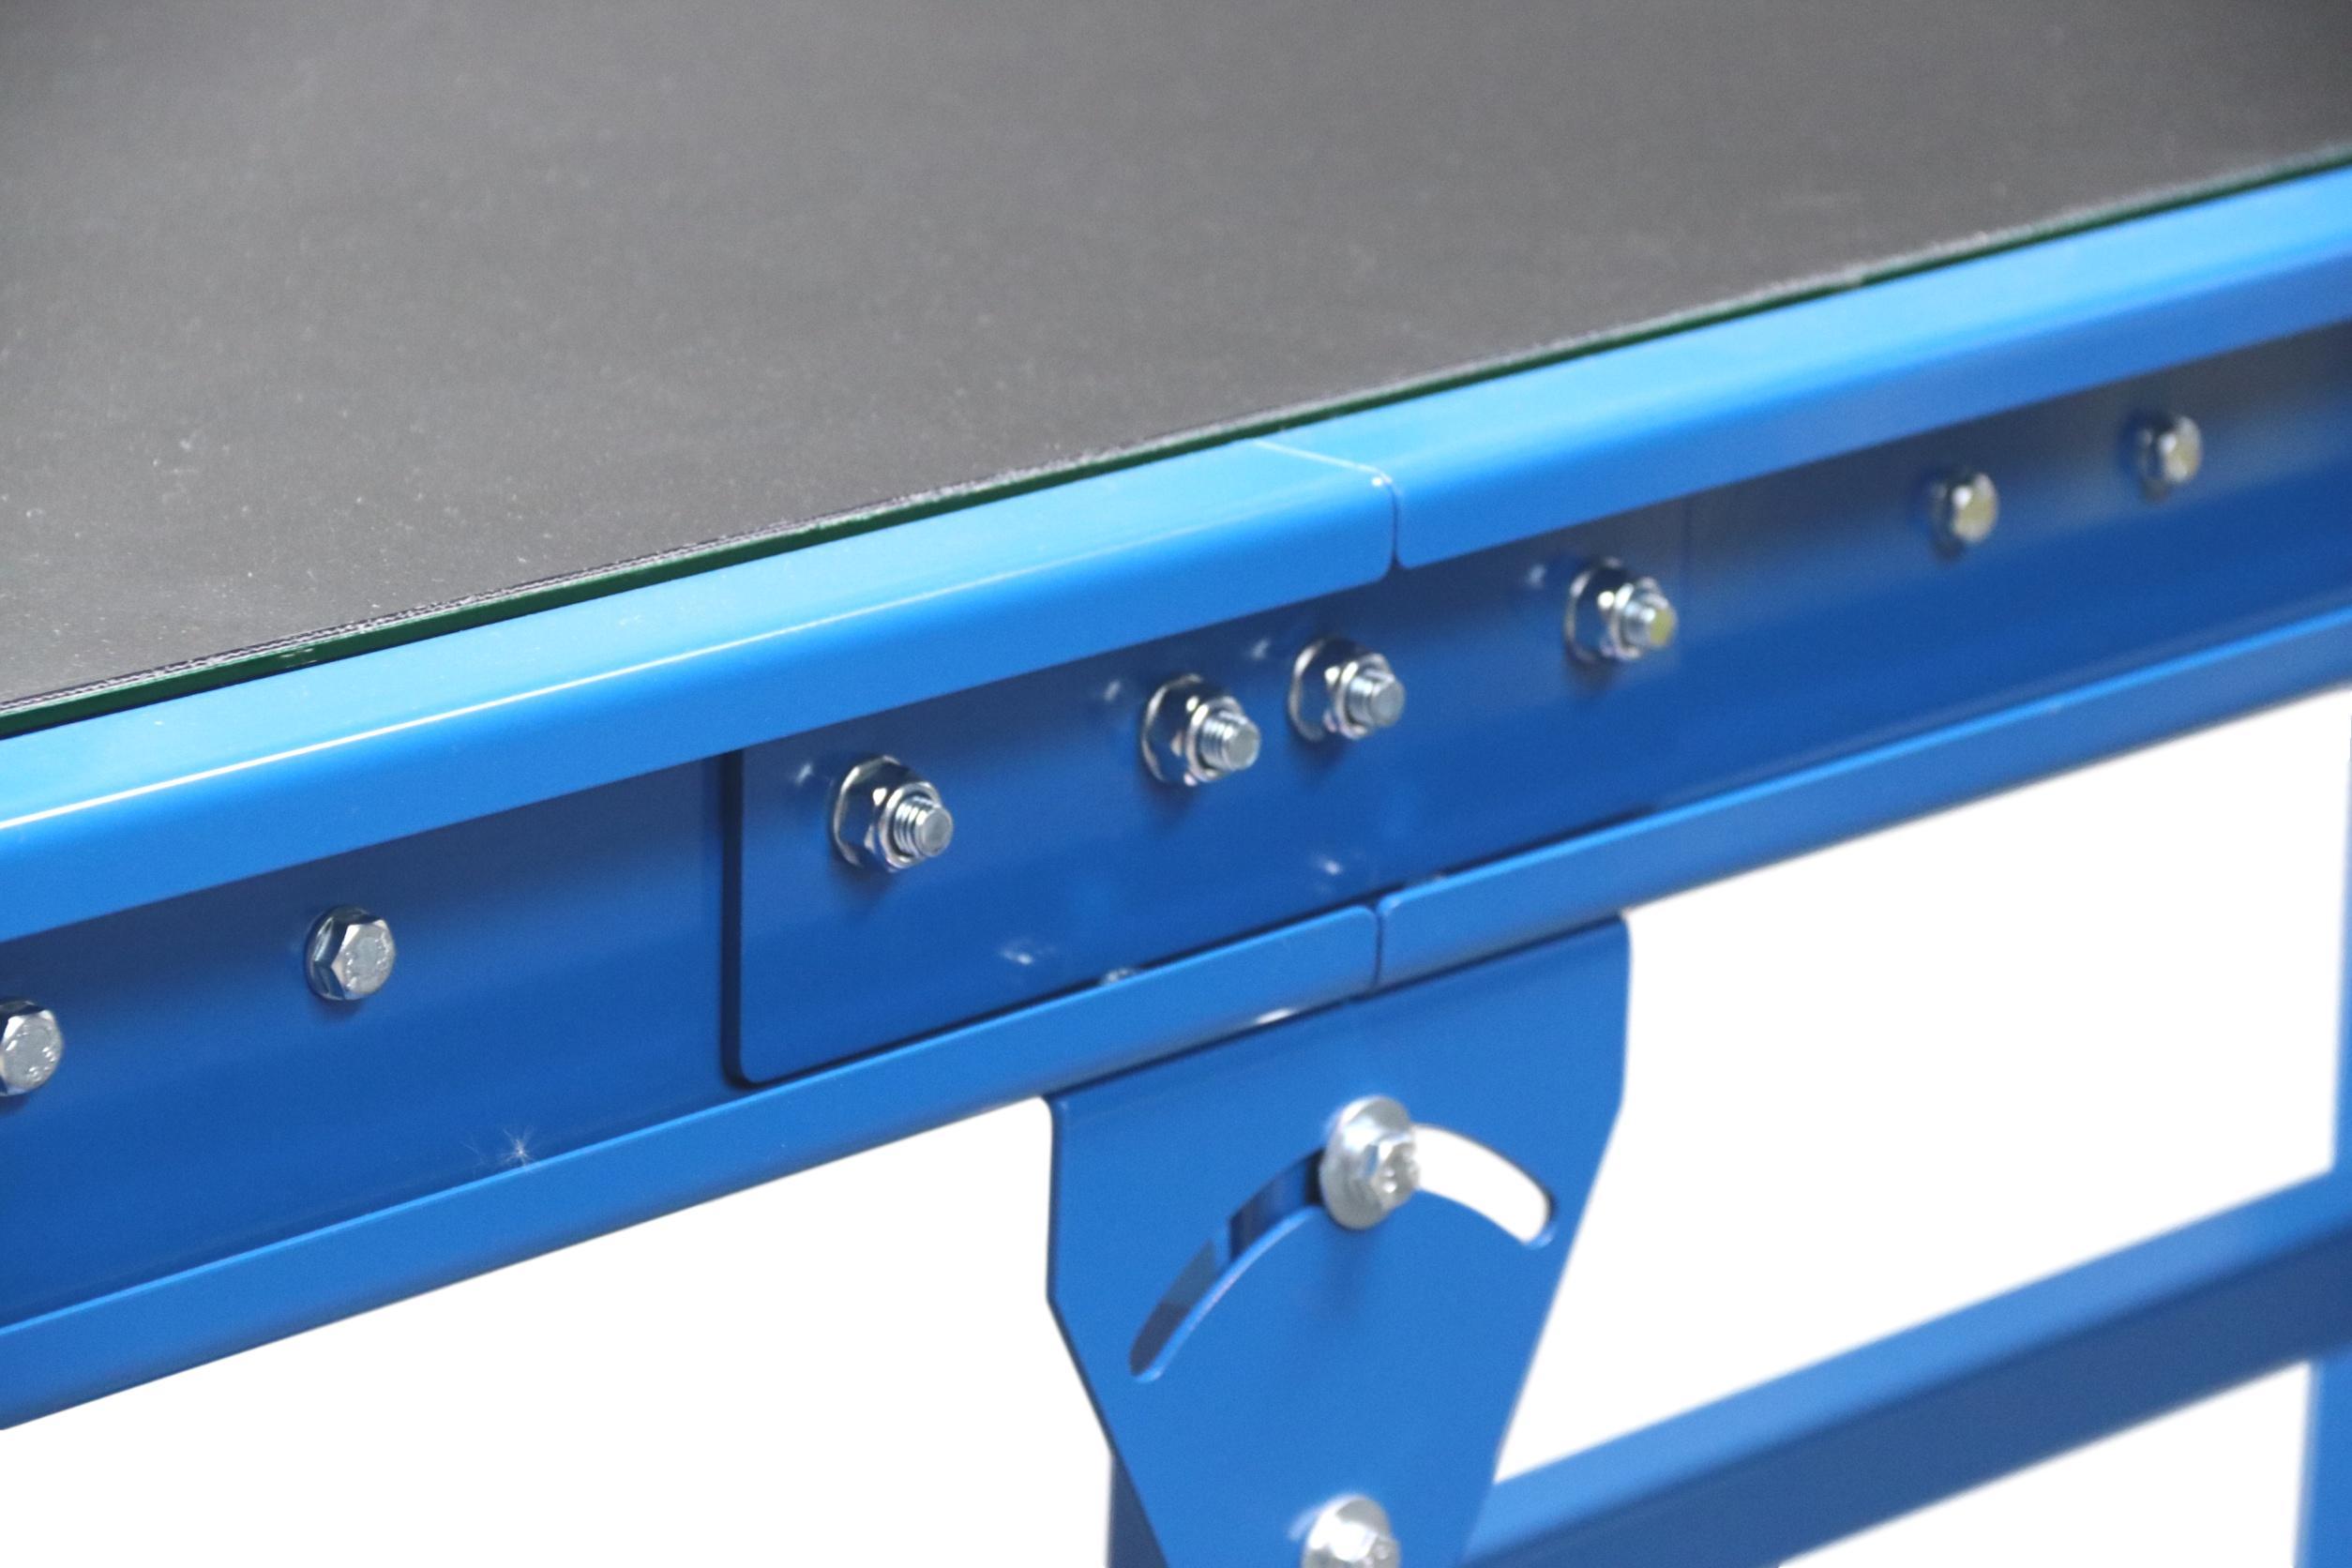 Slim Conveyor Smooth Line Conveyor low profile conveyor belt conveyor manufacturers medium duty belt conveyors